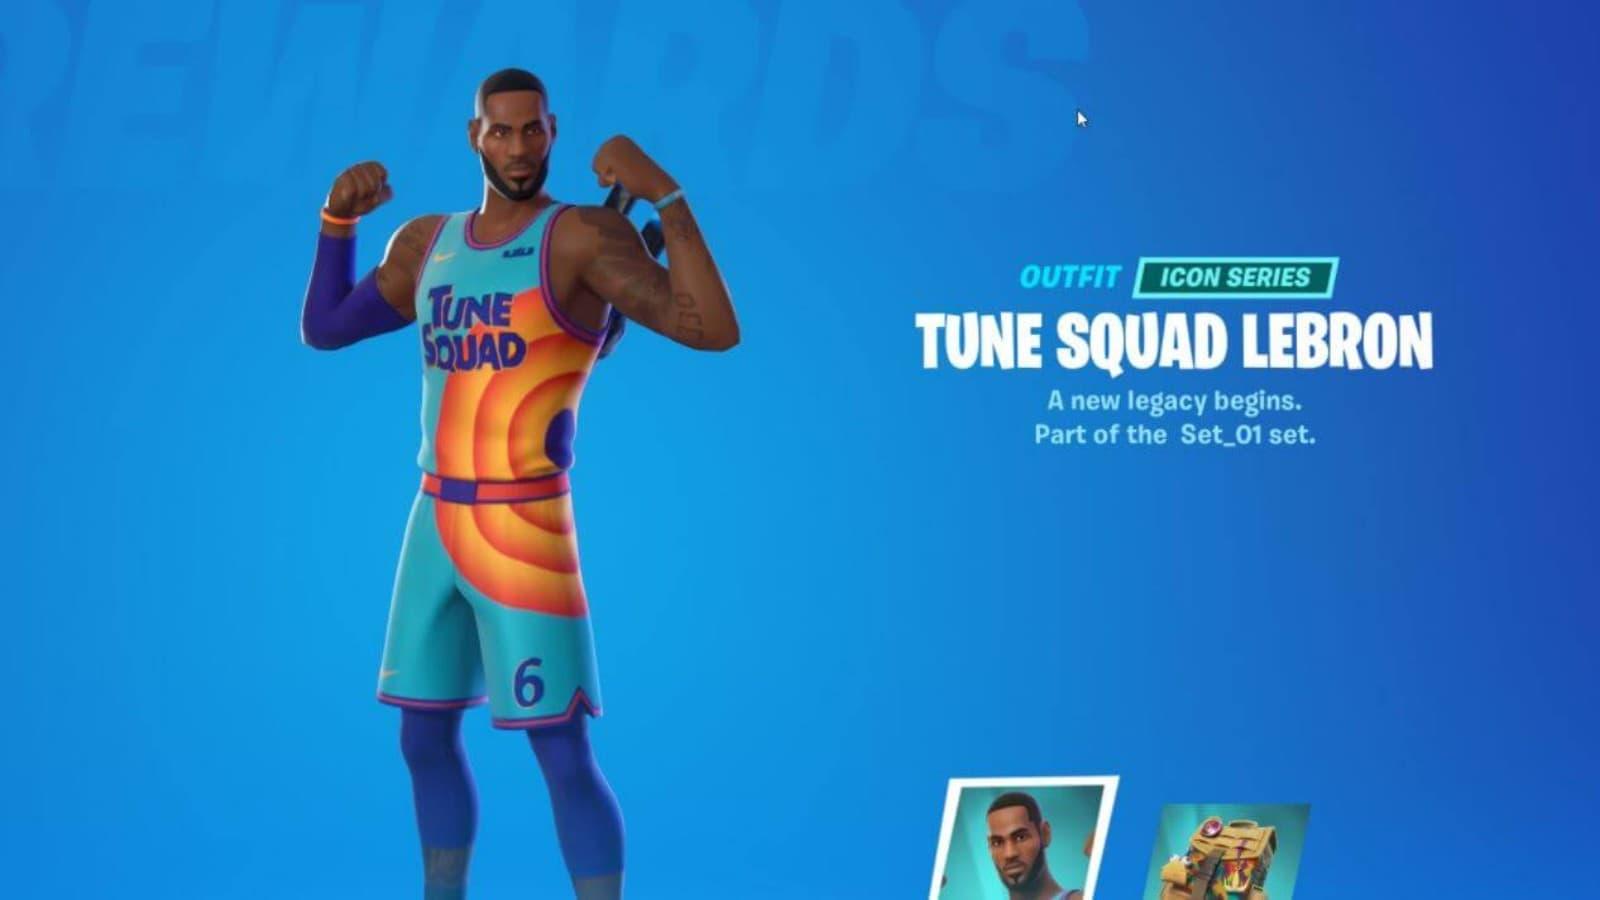 Fortnite LeBron James Skin in Season 7 Icon Series